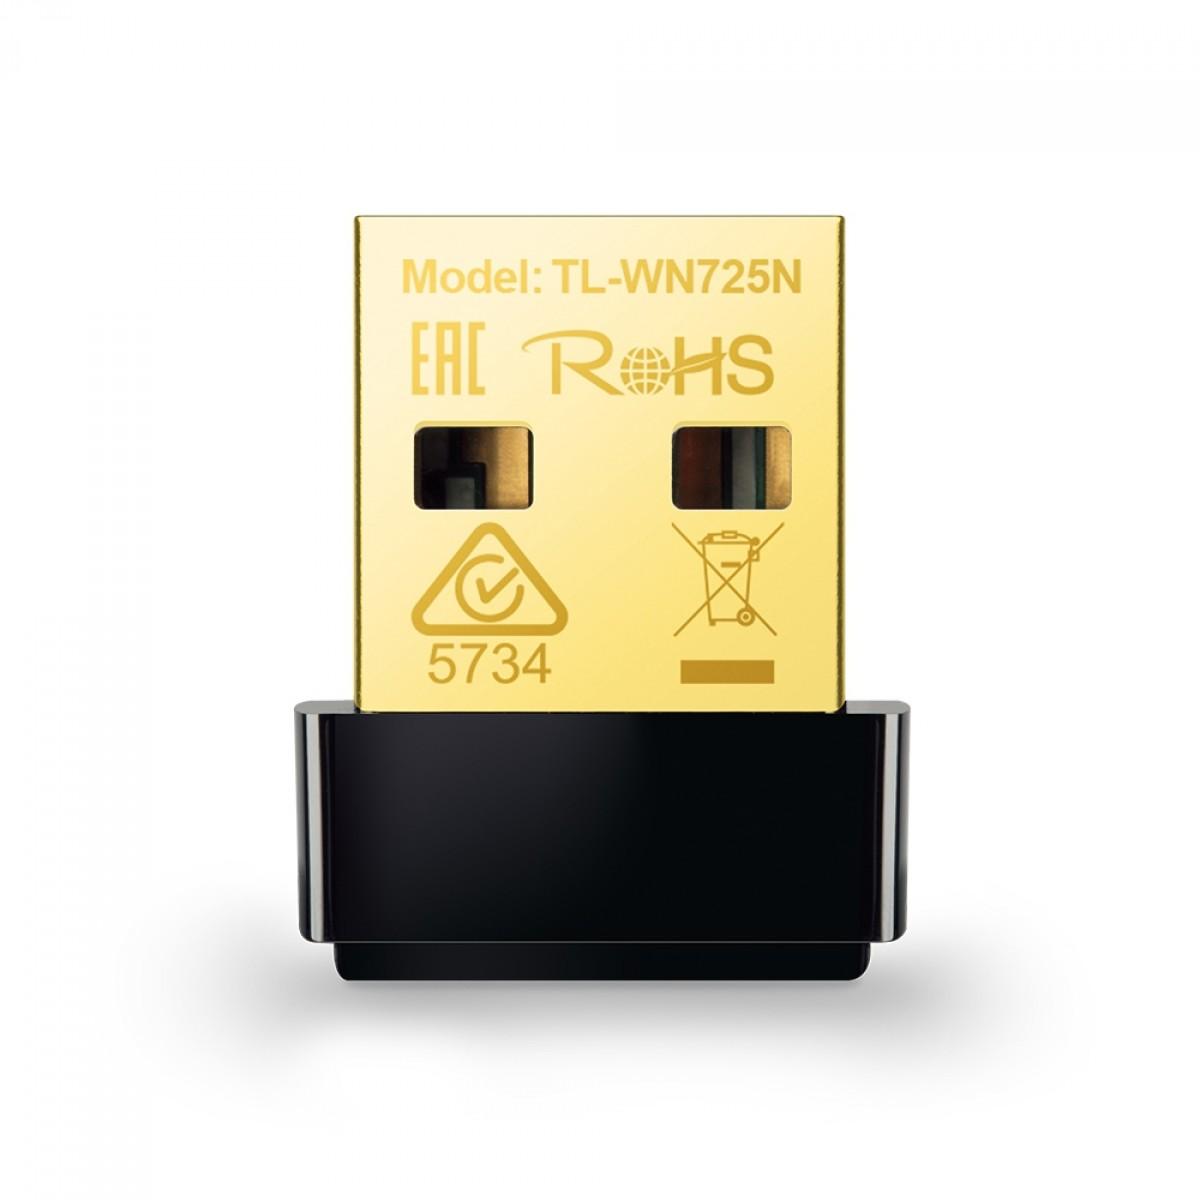 Nano Adaptador  Wireless N USB TP-Link, 150Mbps, TL-WN725N